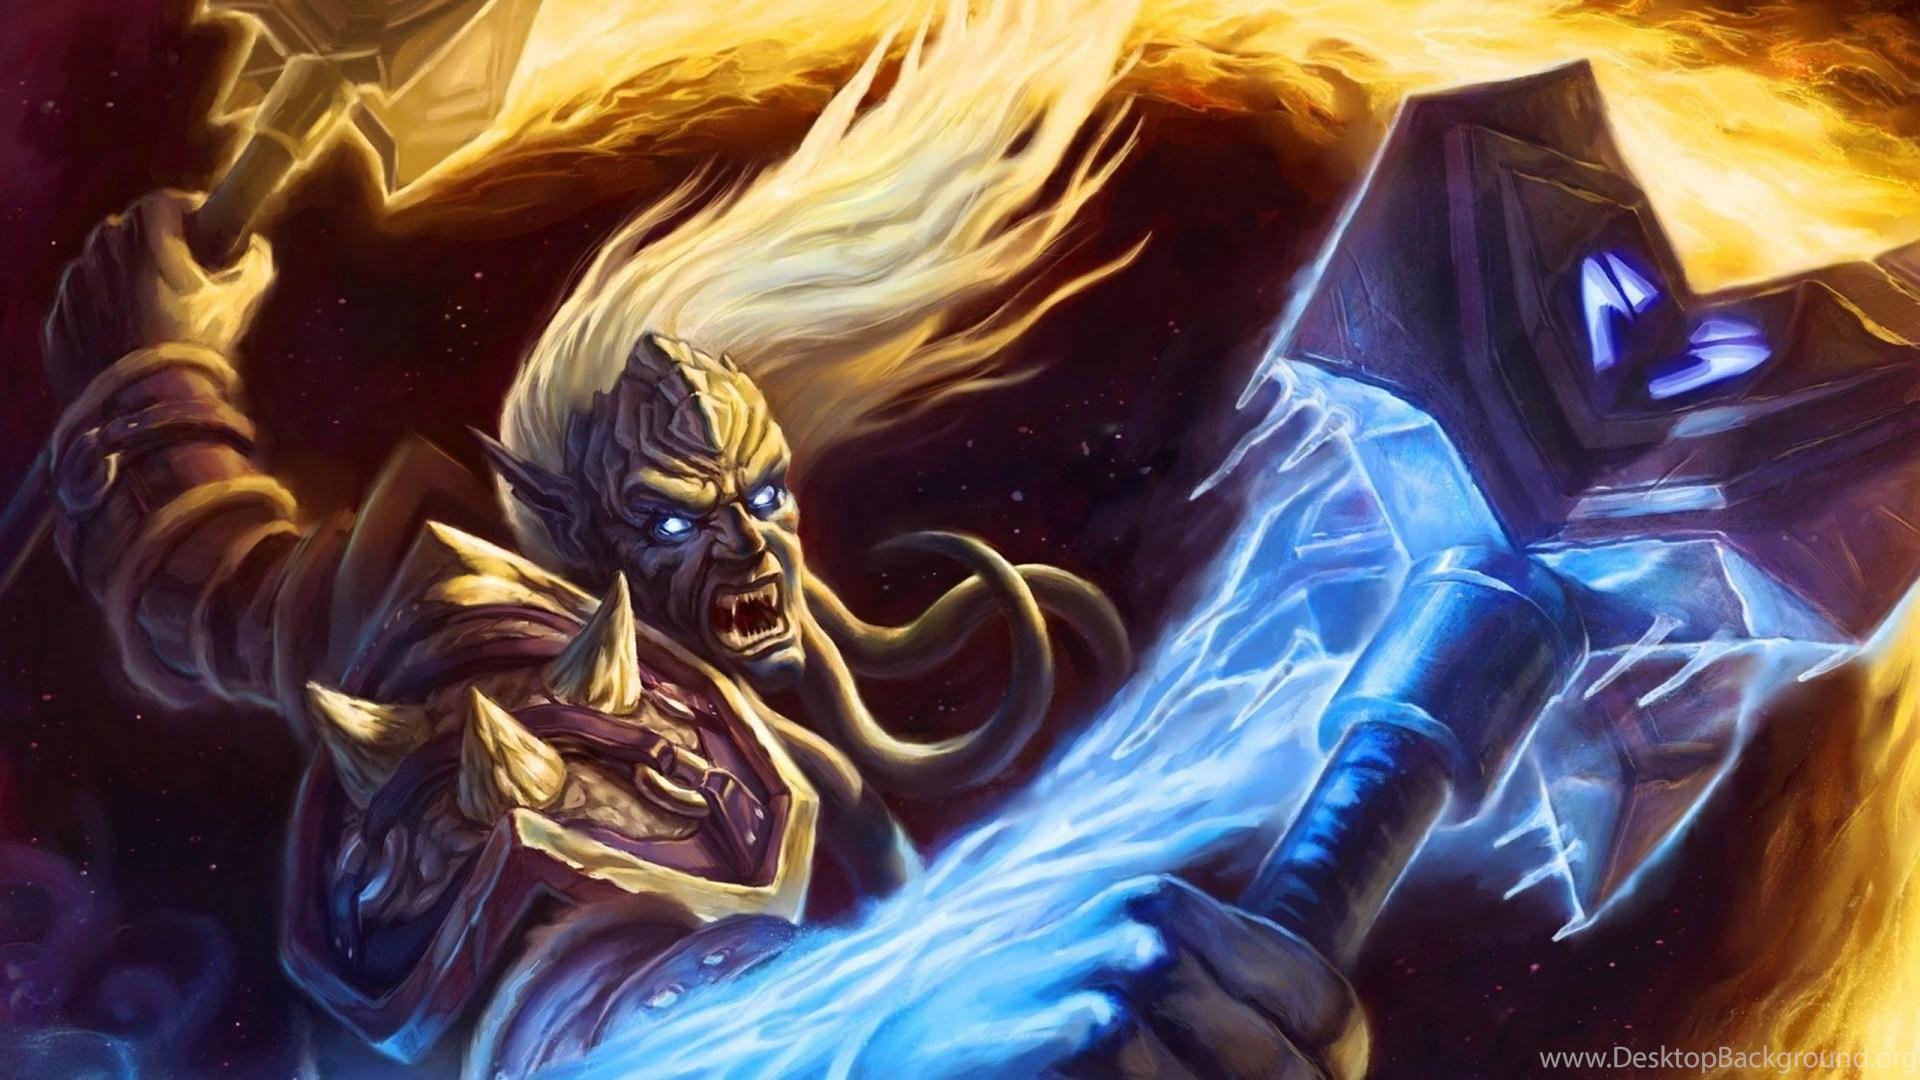 World Of Warcraft Wallpapers Paladin Wallpaper Desktop Background